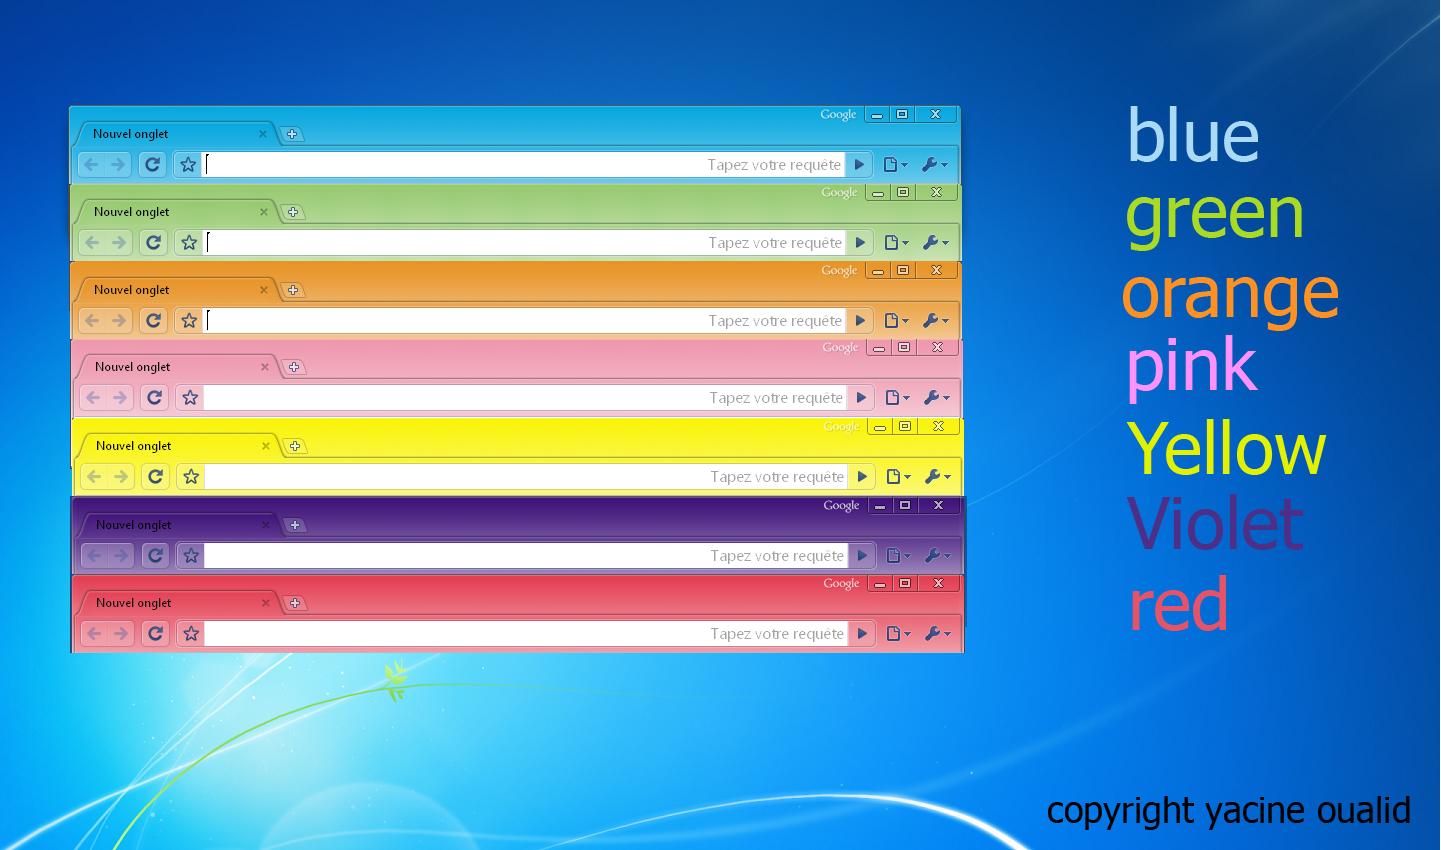 All Color Google Chrome By Yacine29 On DeviantArt